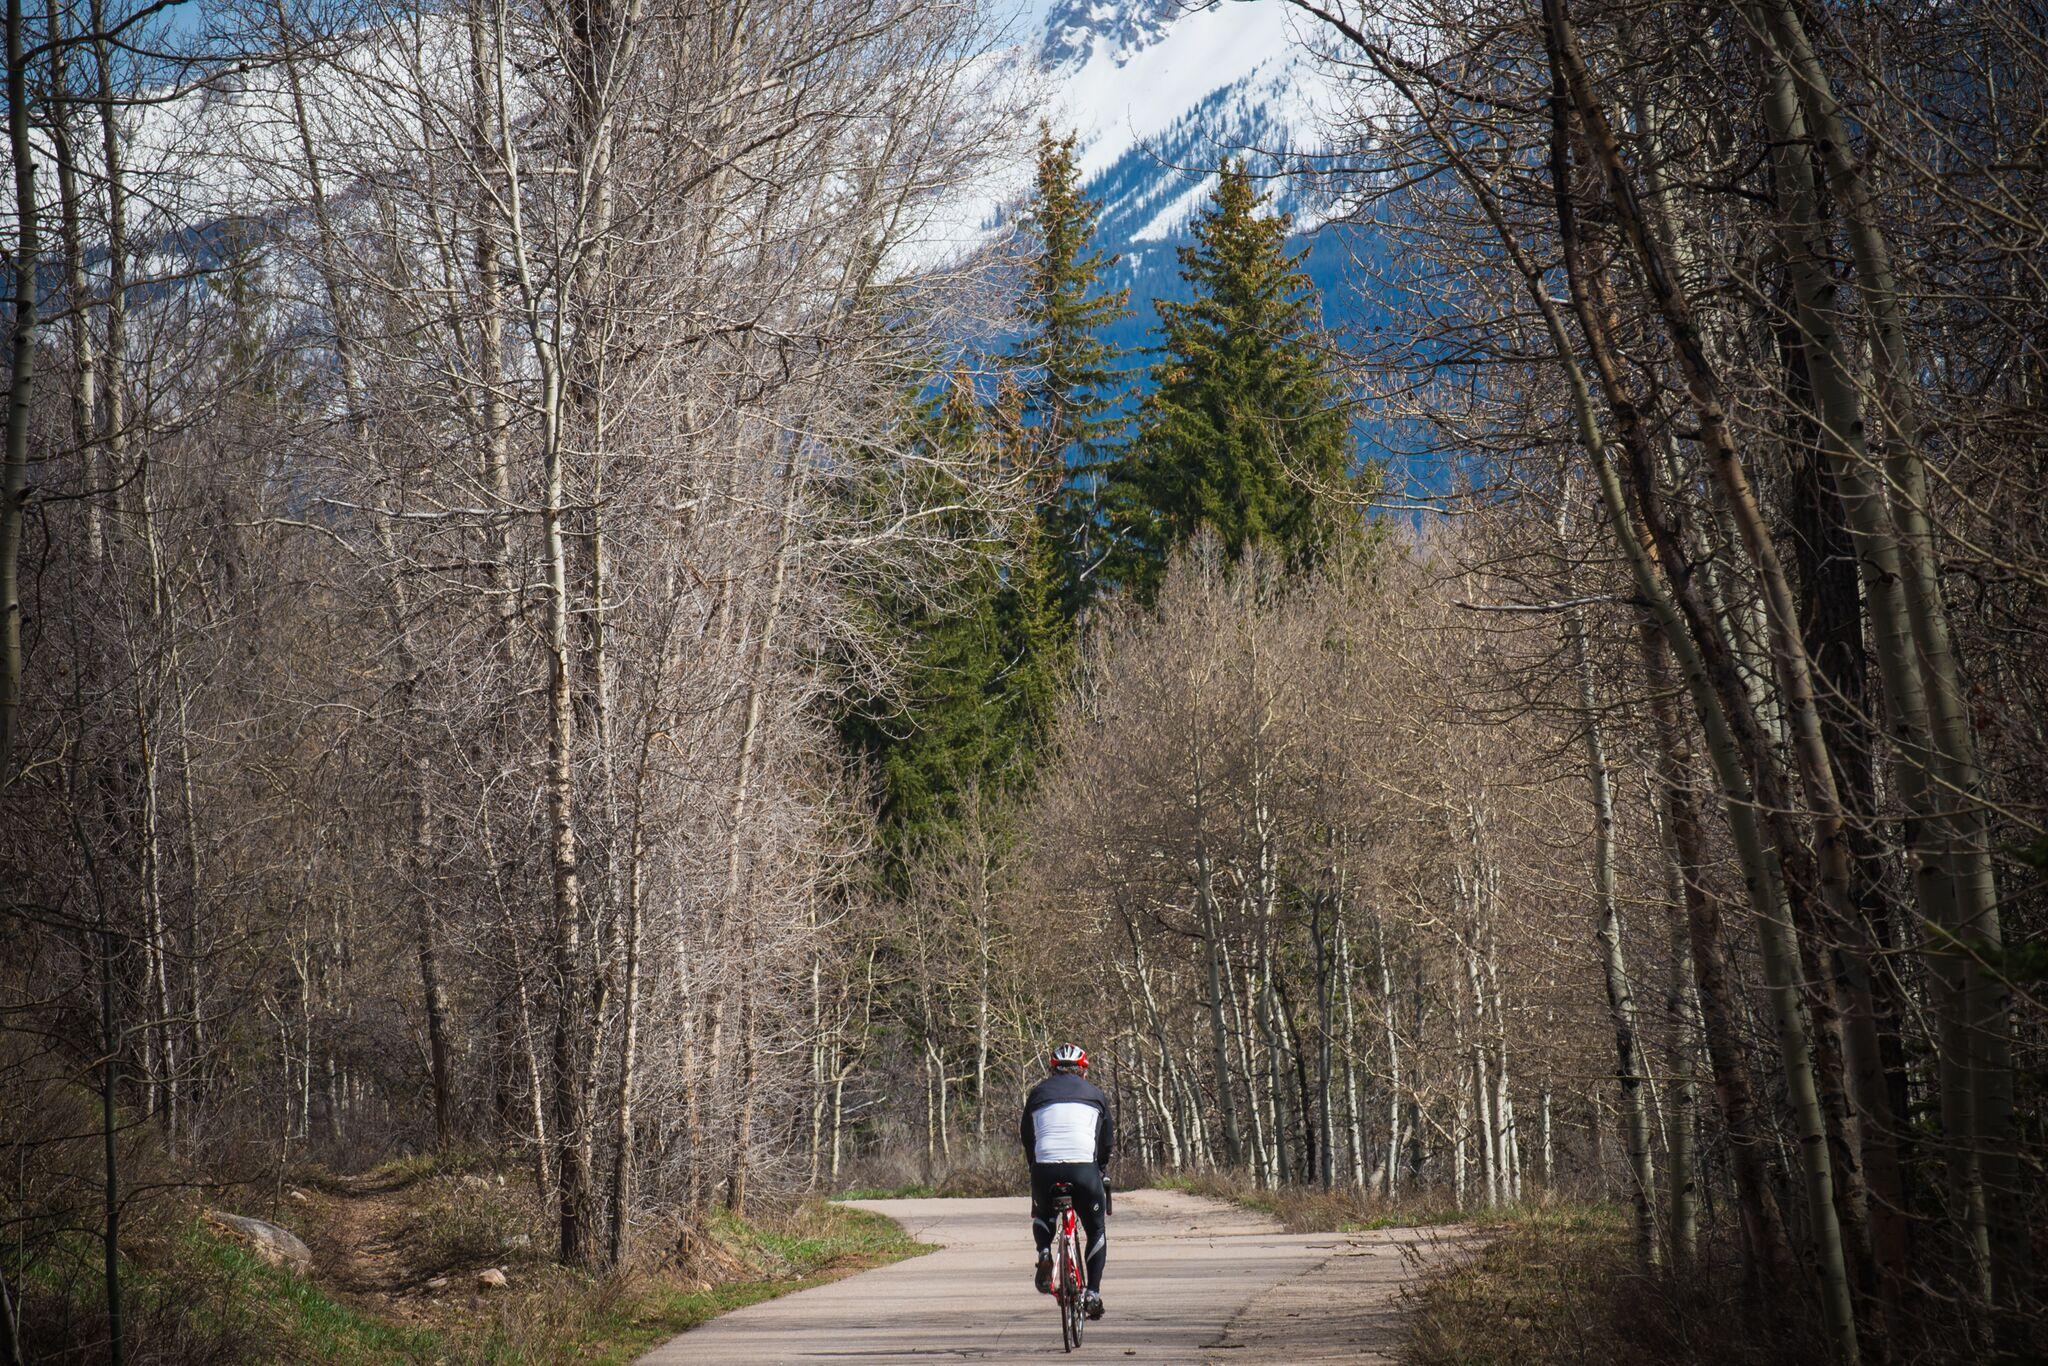 biking.RioGrande.Spring.Aspen.jpeg